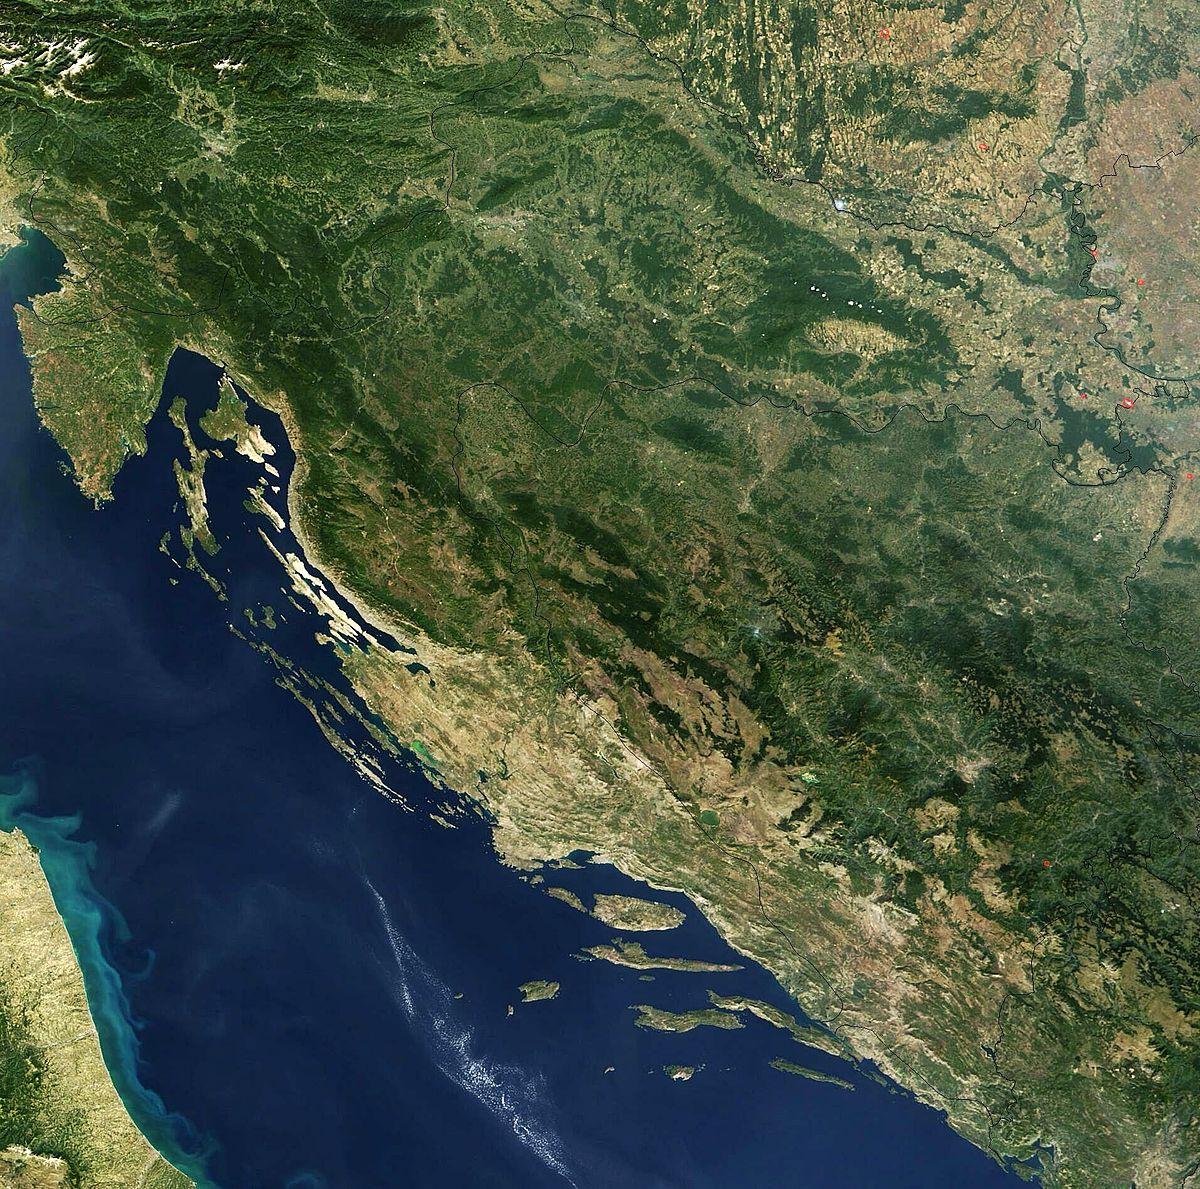 Horvatorszag Foldrajza Wikipedia